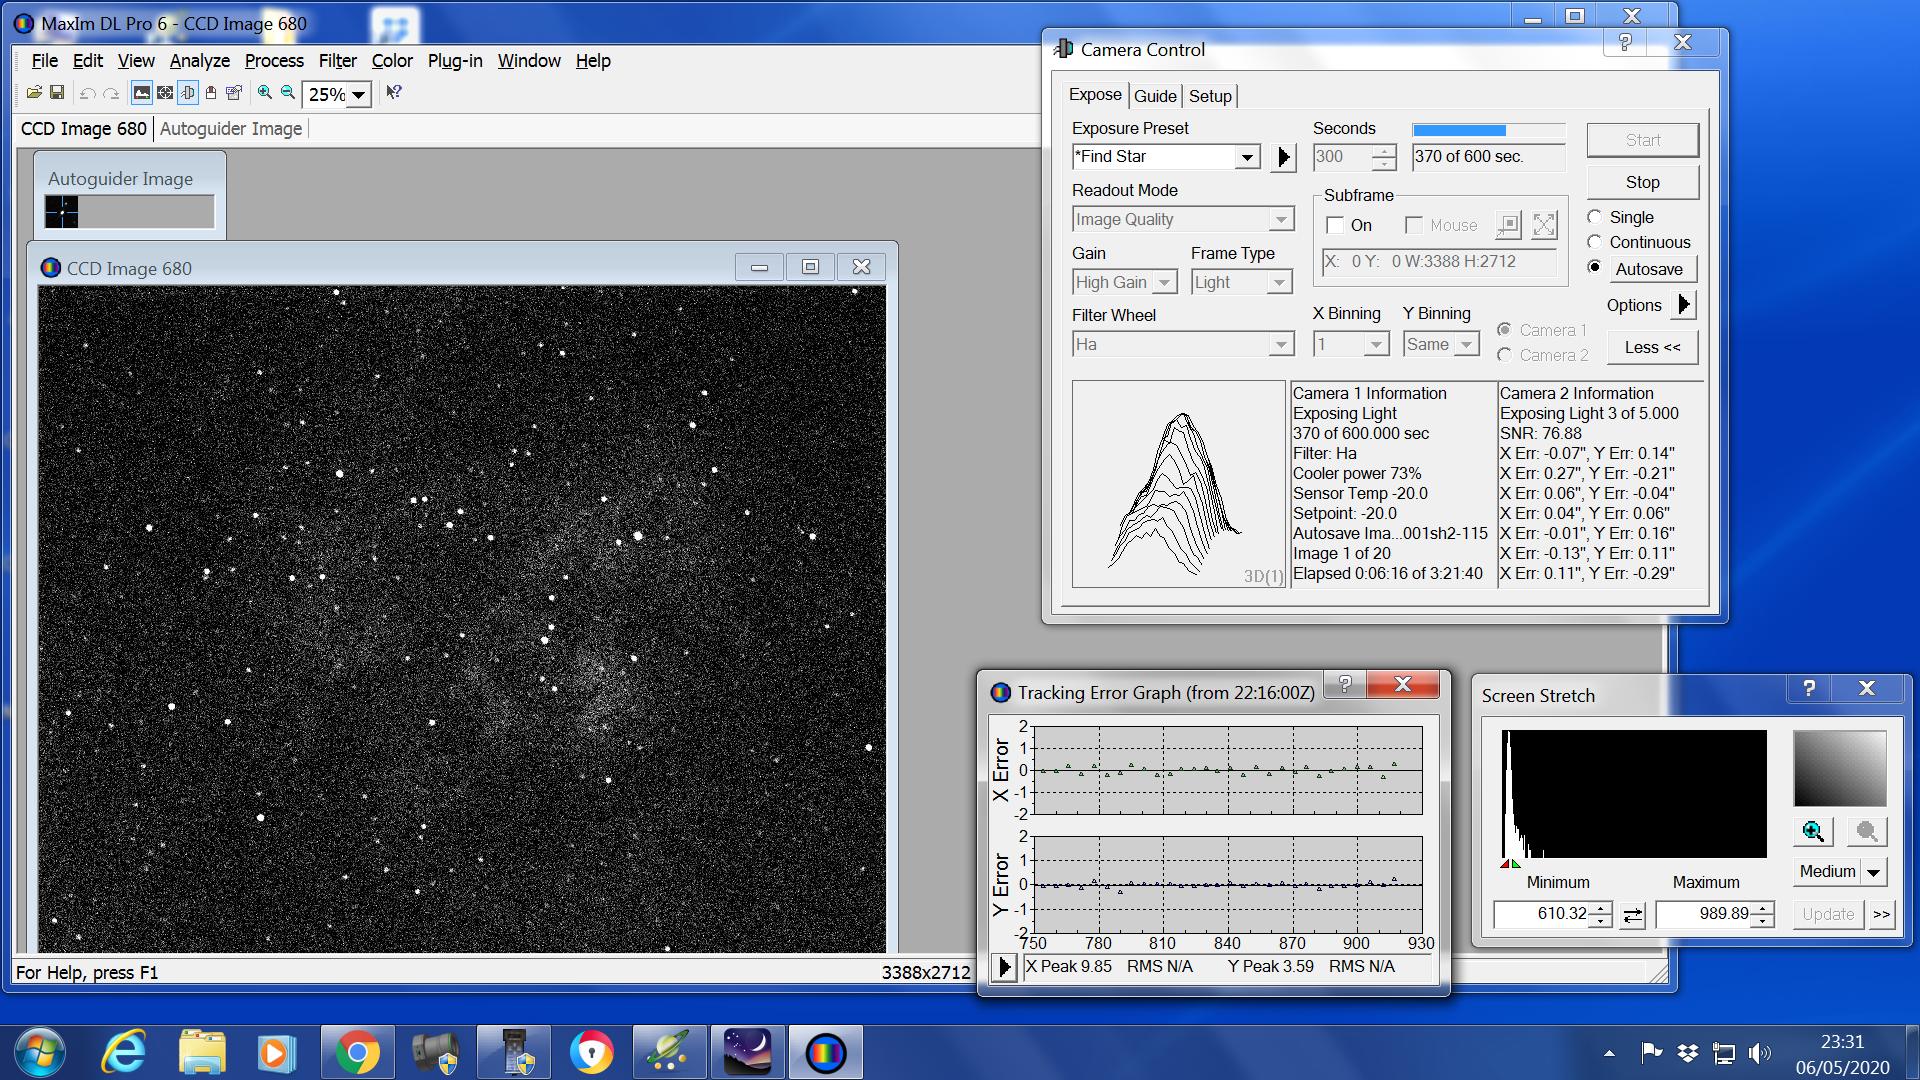 Screenshot 2020-05-06 23.31.21.png